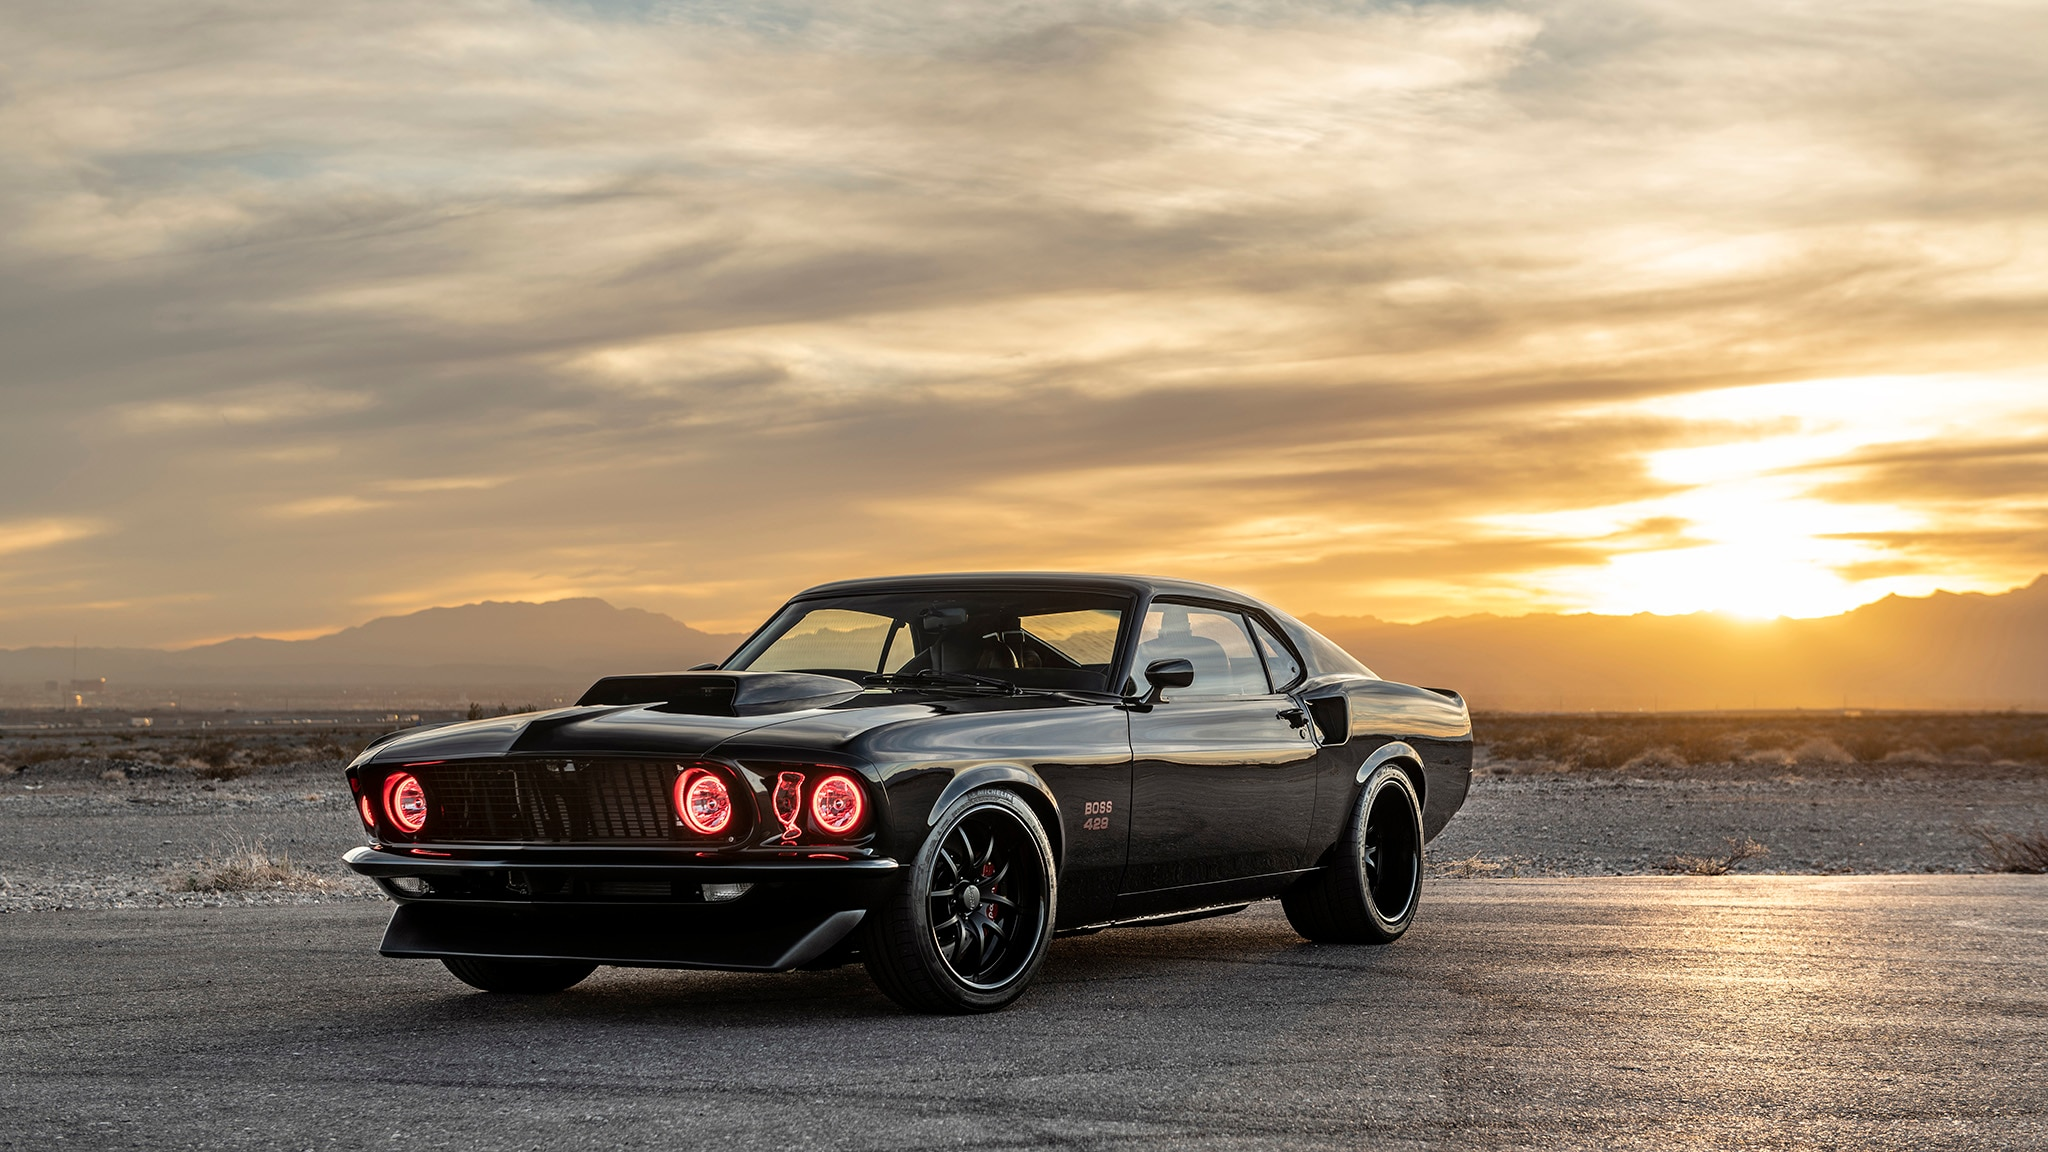 09 Classic Recreations 1969 Boss 429 Mustang